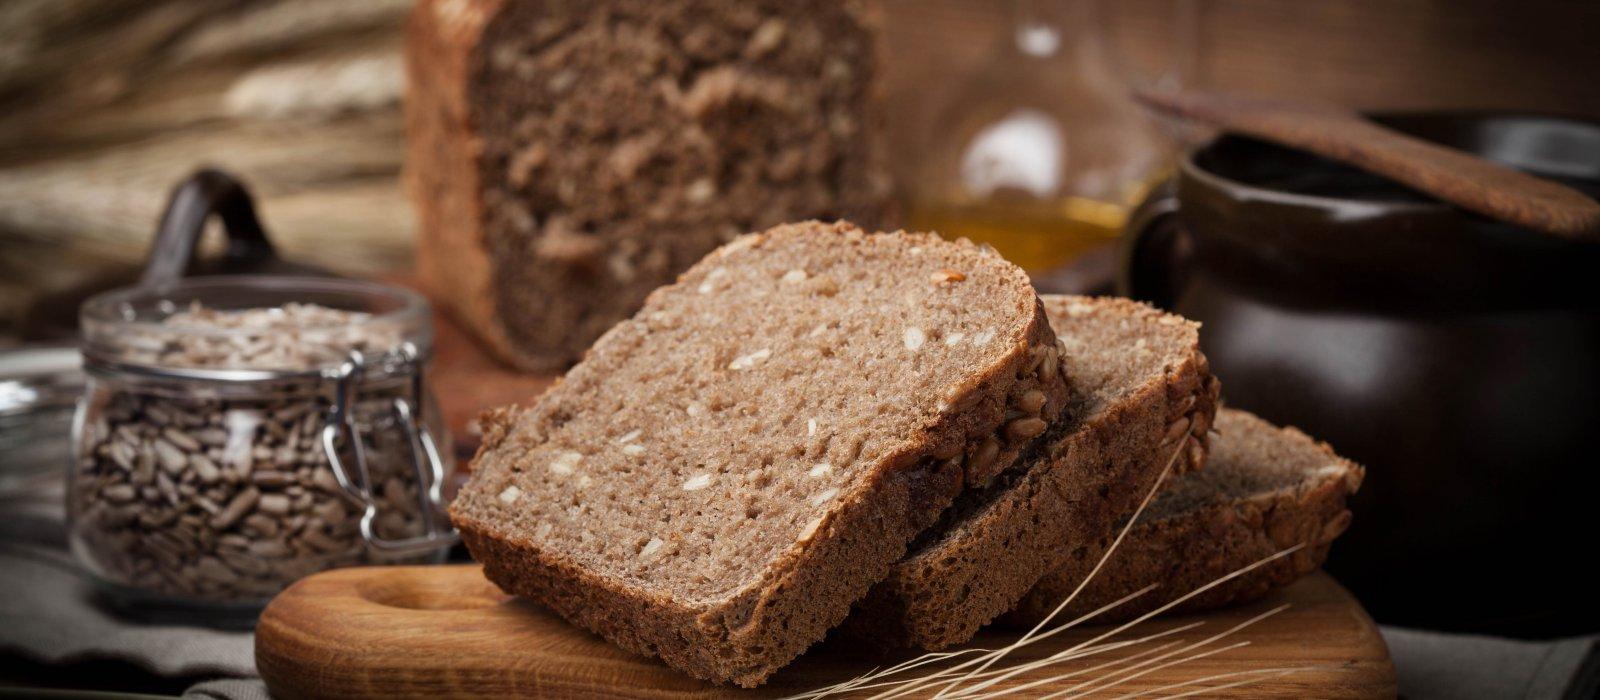 <span> Ψωμί Χαμηλού Γλυκαιμικού Δείκτη</span>